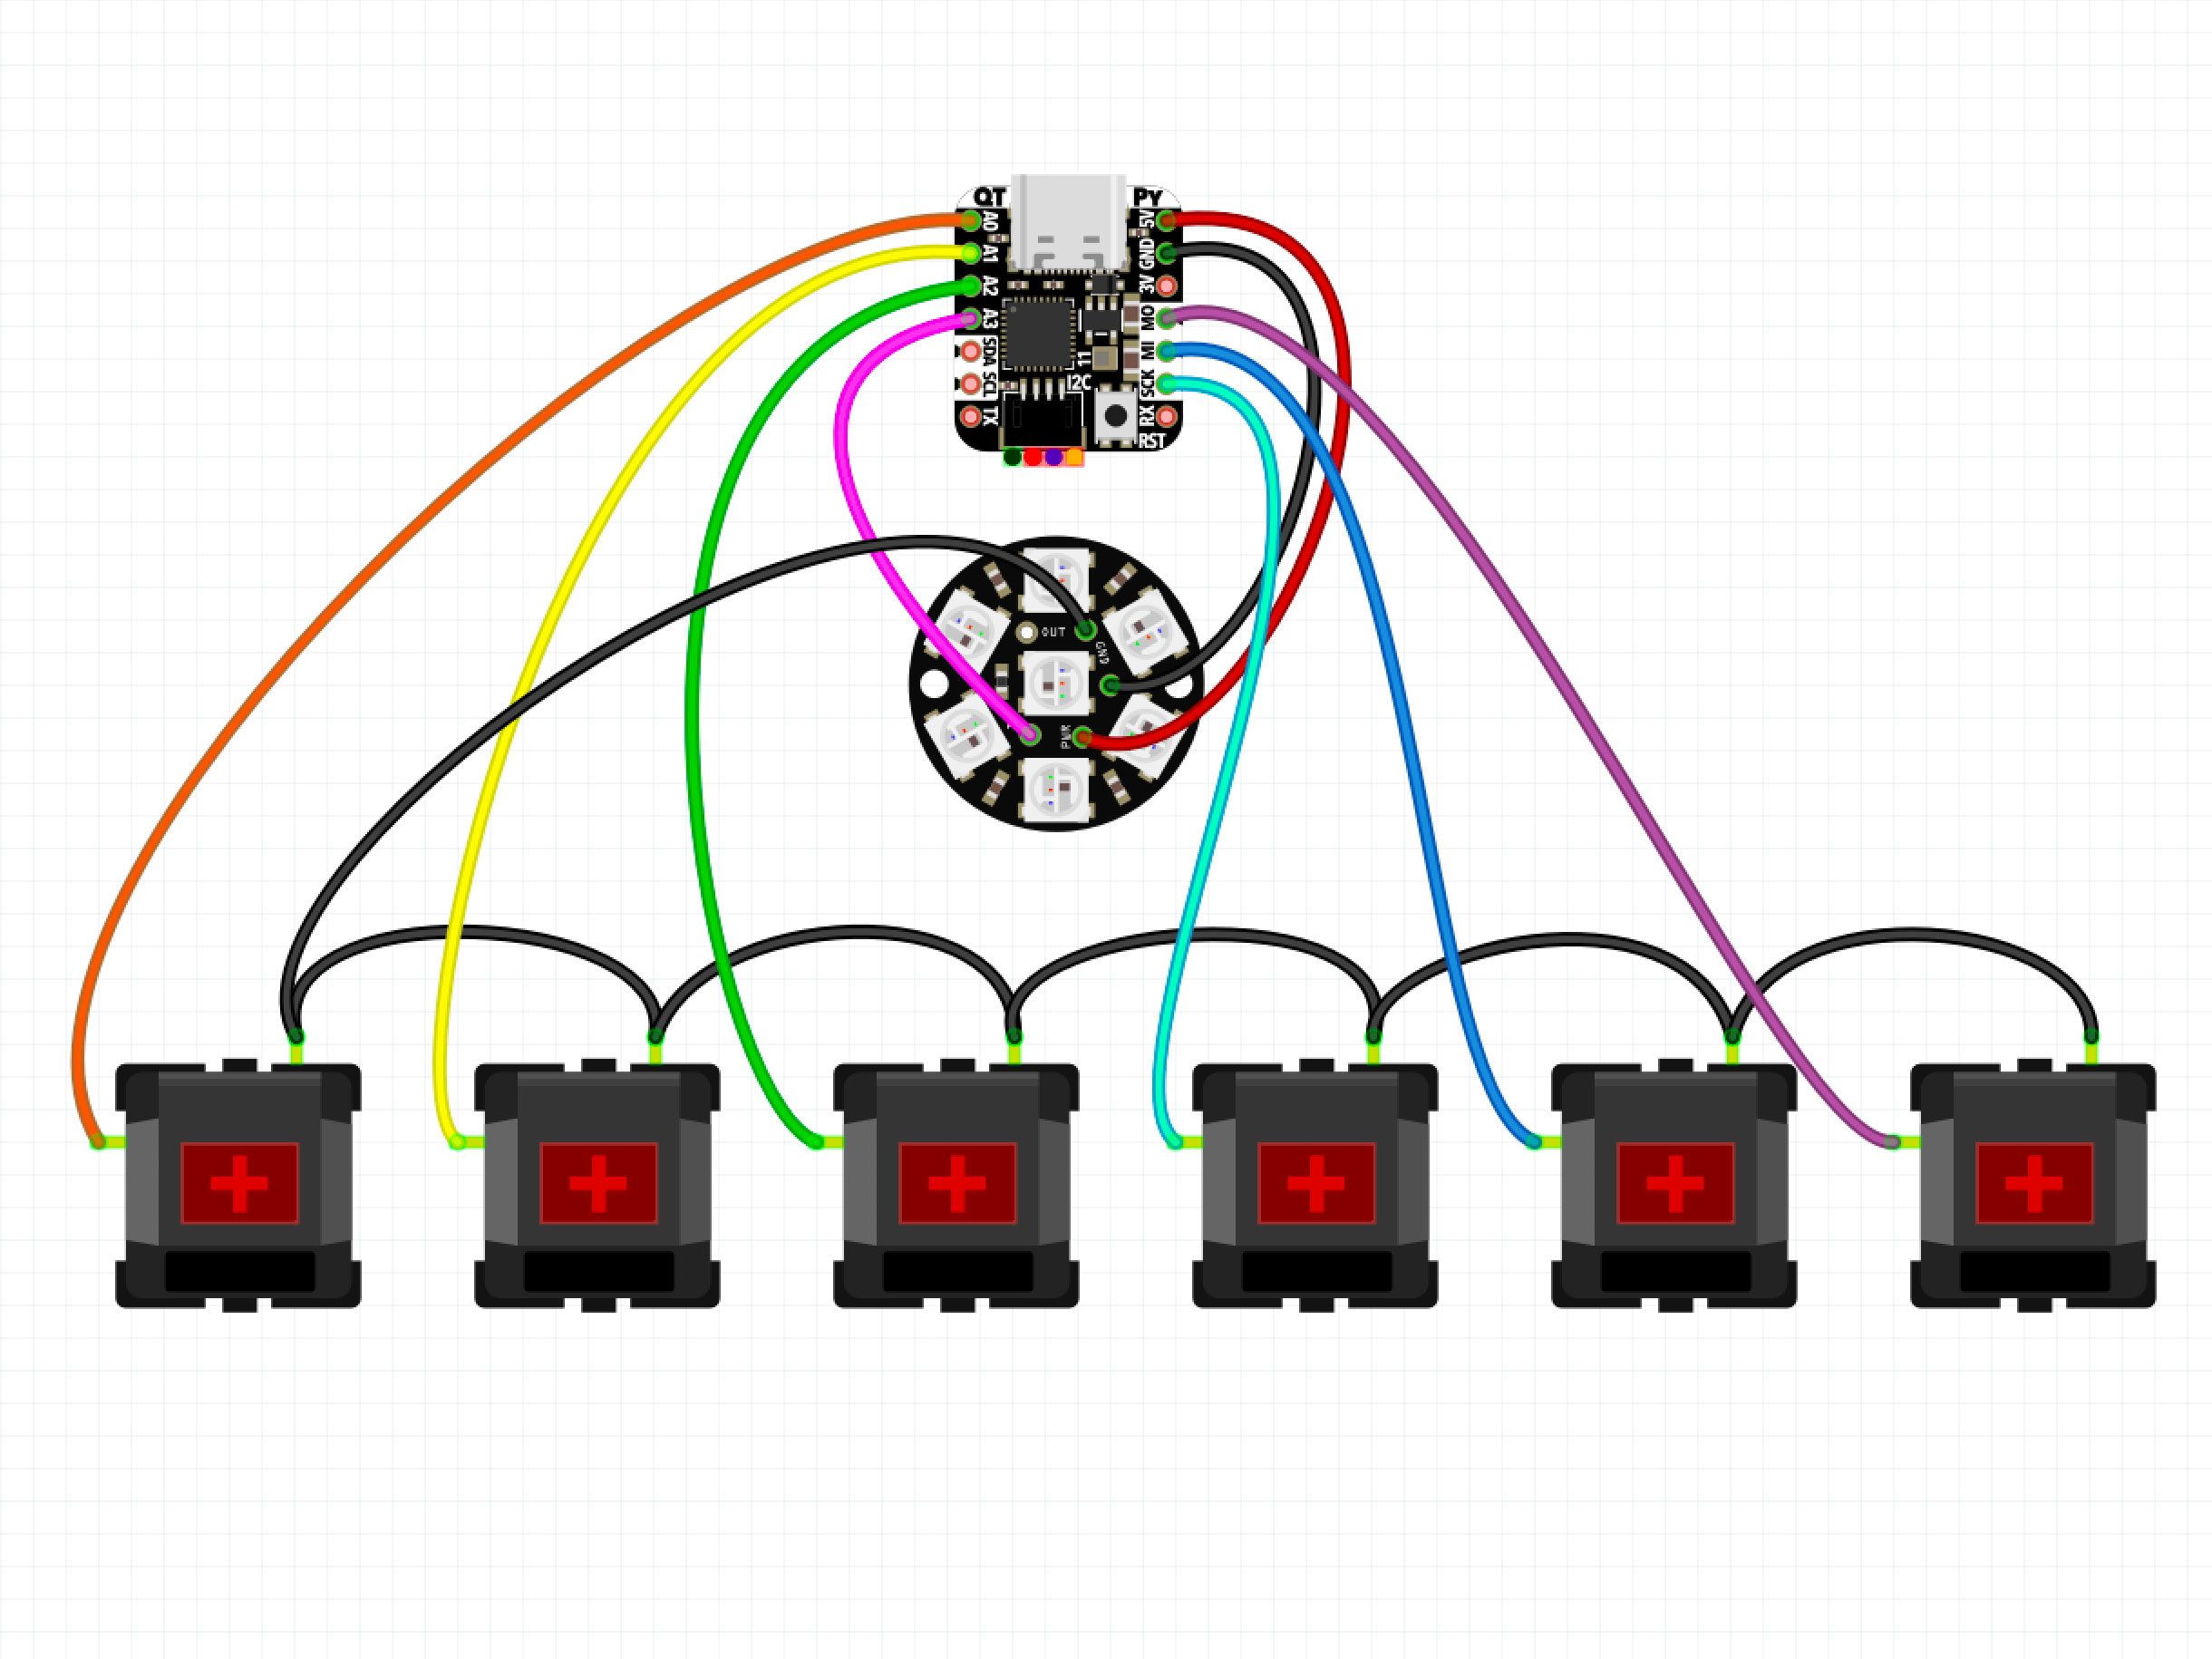 3d_printing_qtpy-rp2040-circuitdiagram.jpg